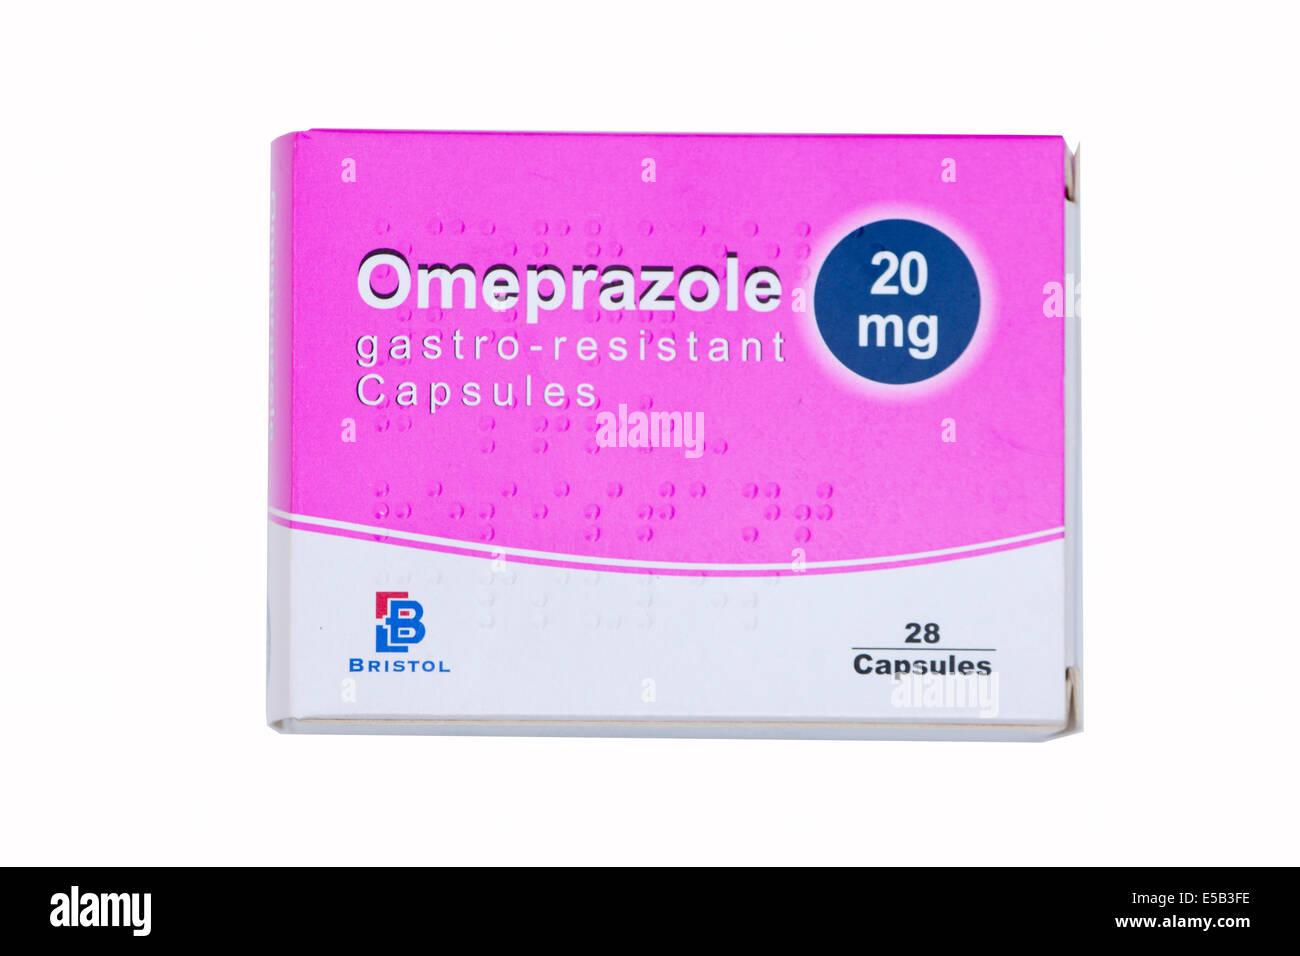 Pack of Omeprazole 20mg capsules Stock Photo: 72159010 - Alamy